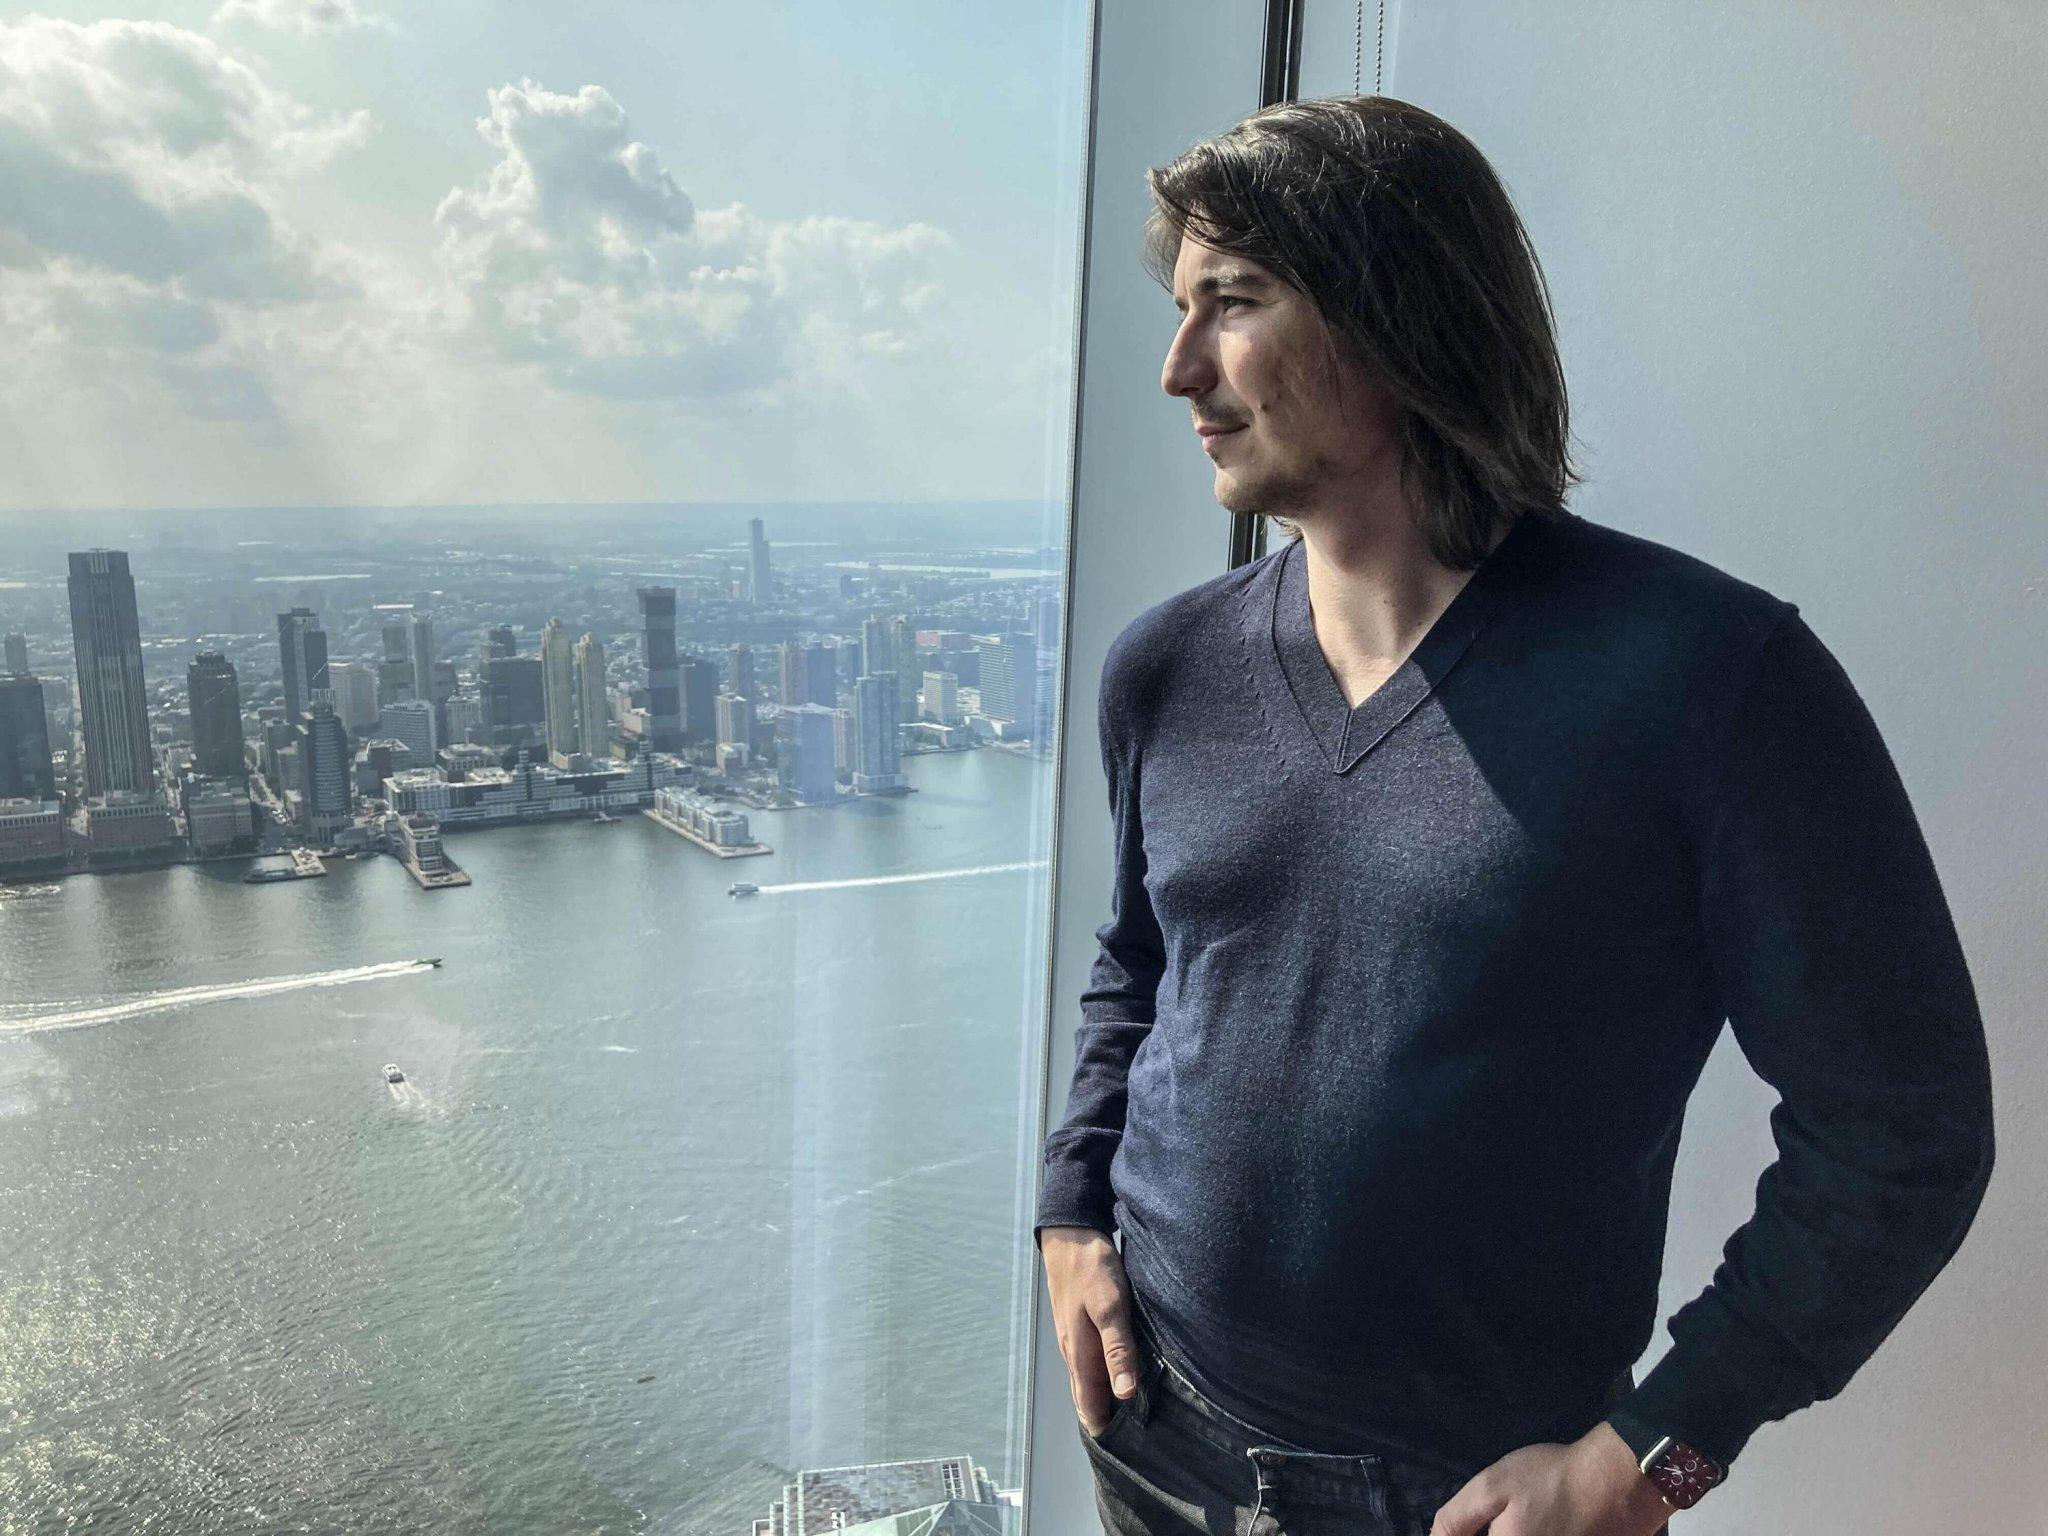 Robinhood CEO tells AP it's eyeing expansion beyond trading